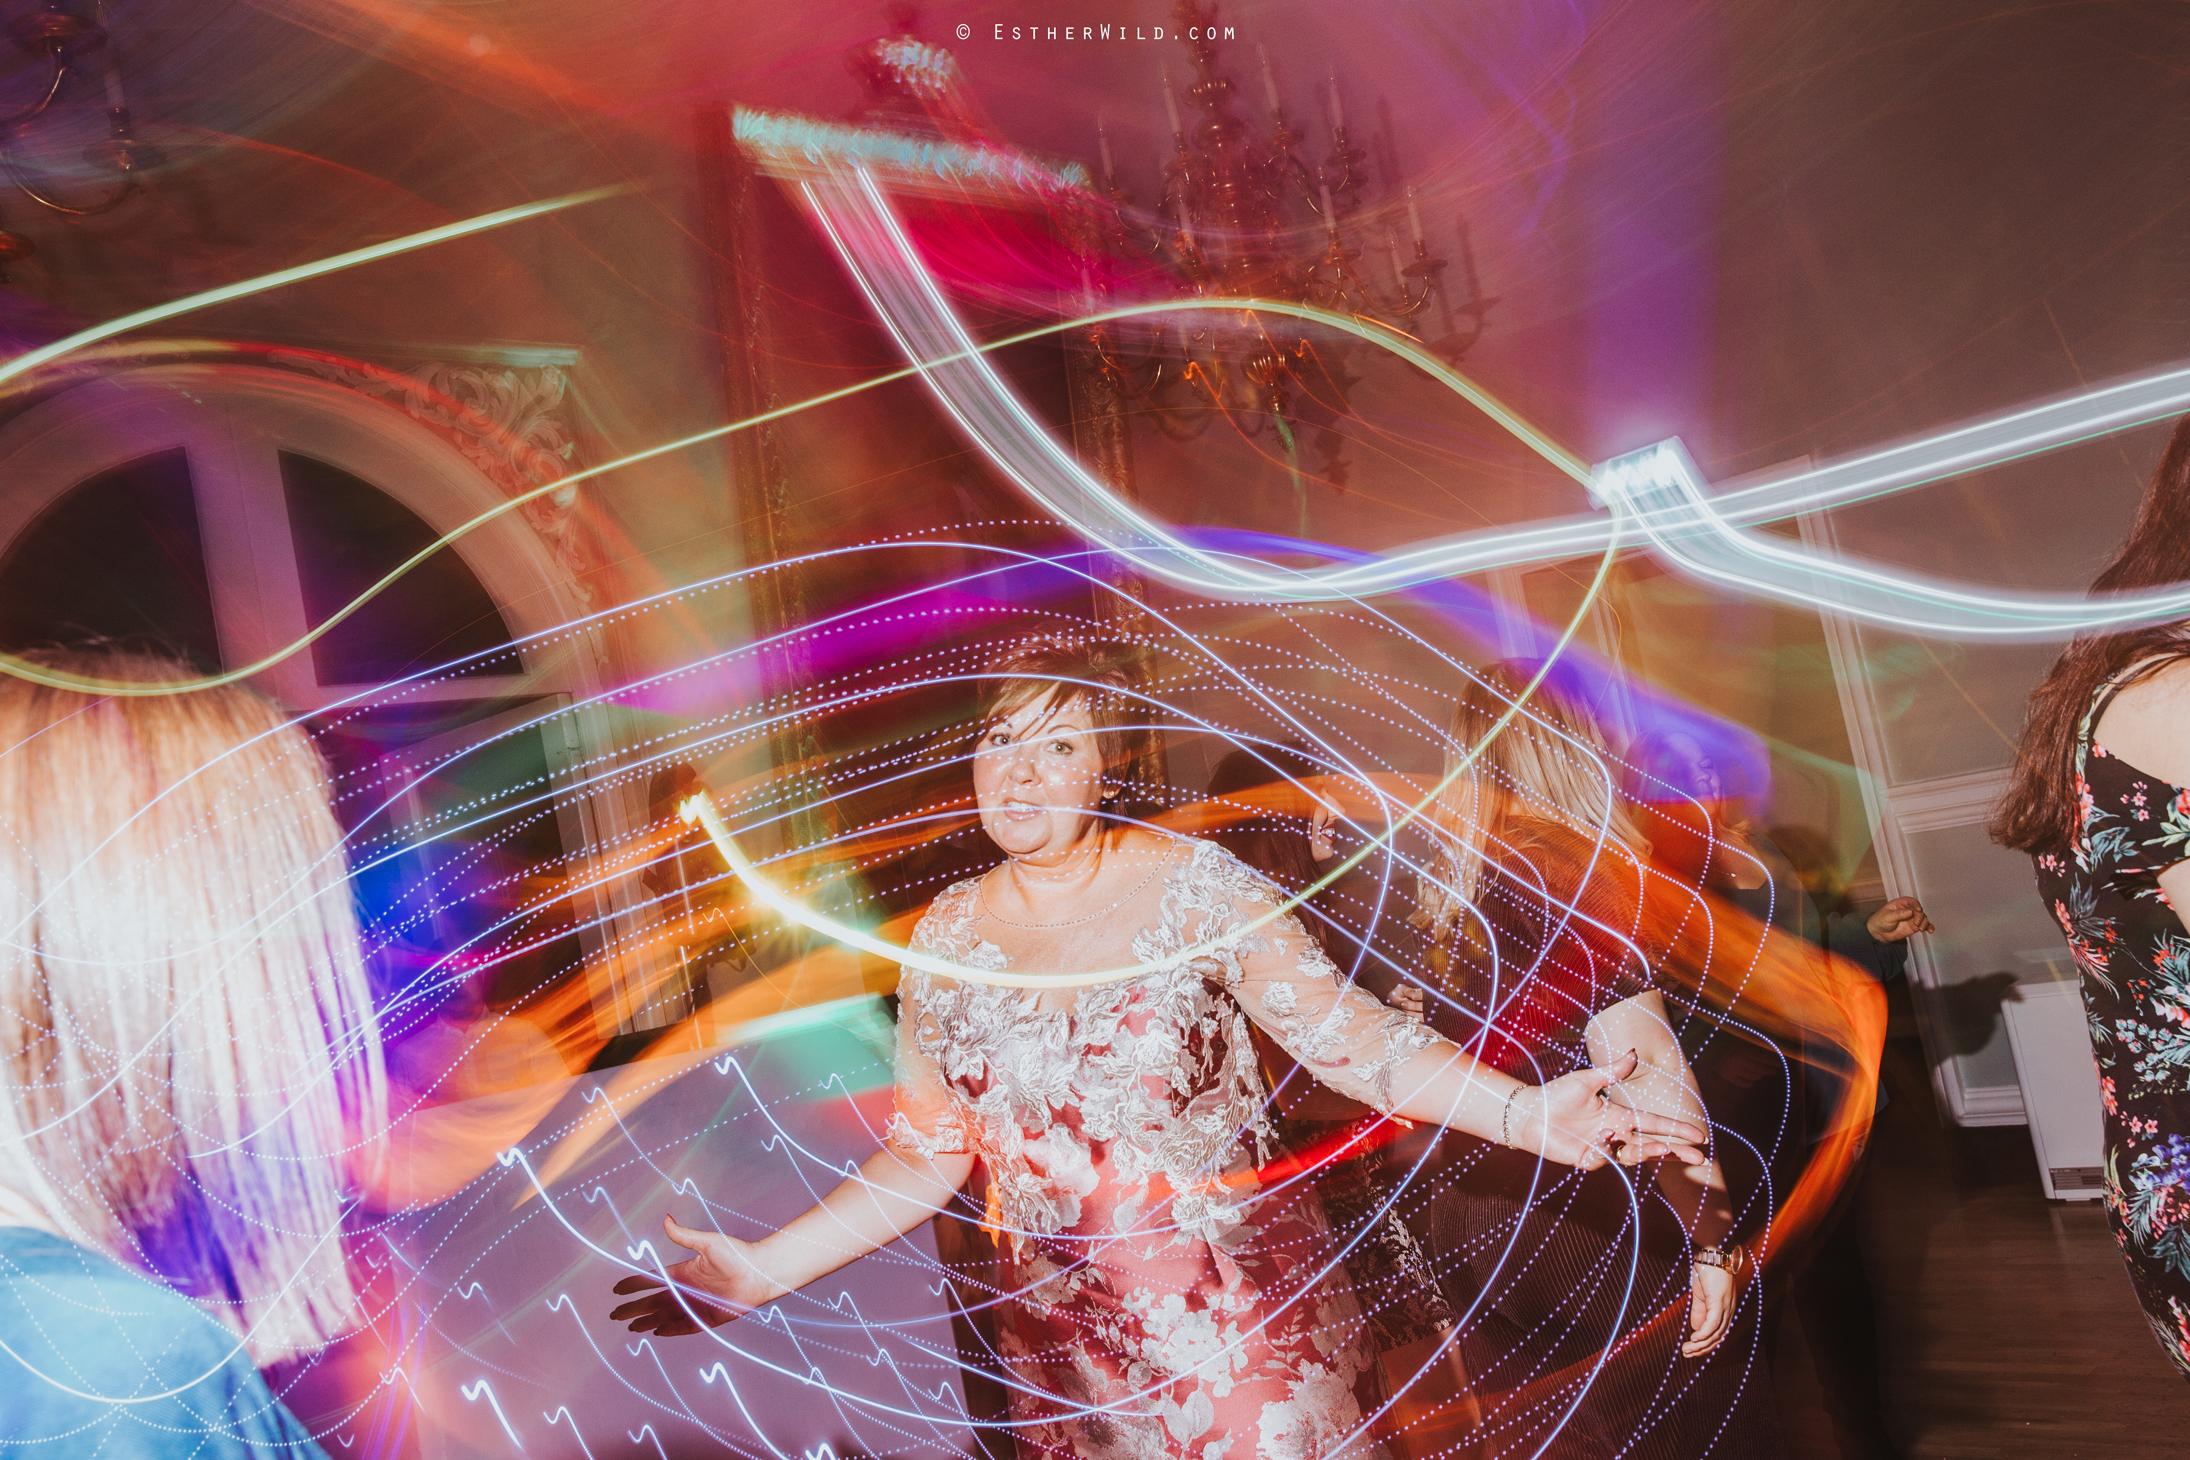 Wedding_Kings_Lynn_Town_Hall_Norfolk_Photographer_Esther_Wild_IMGL0953.jpg